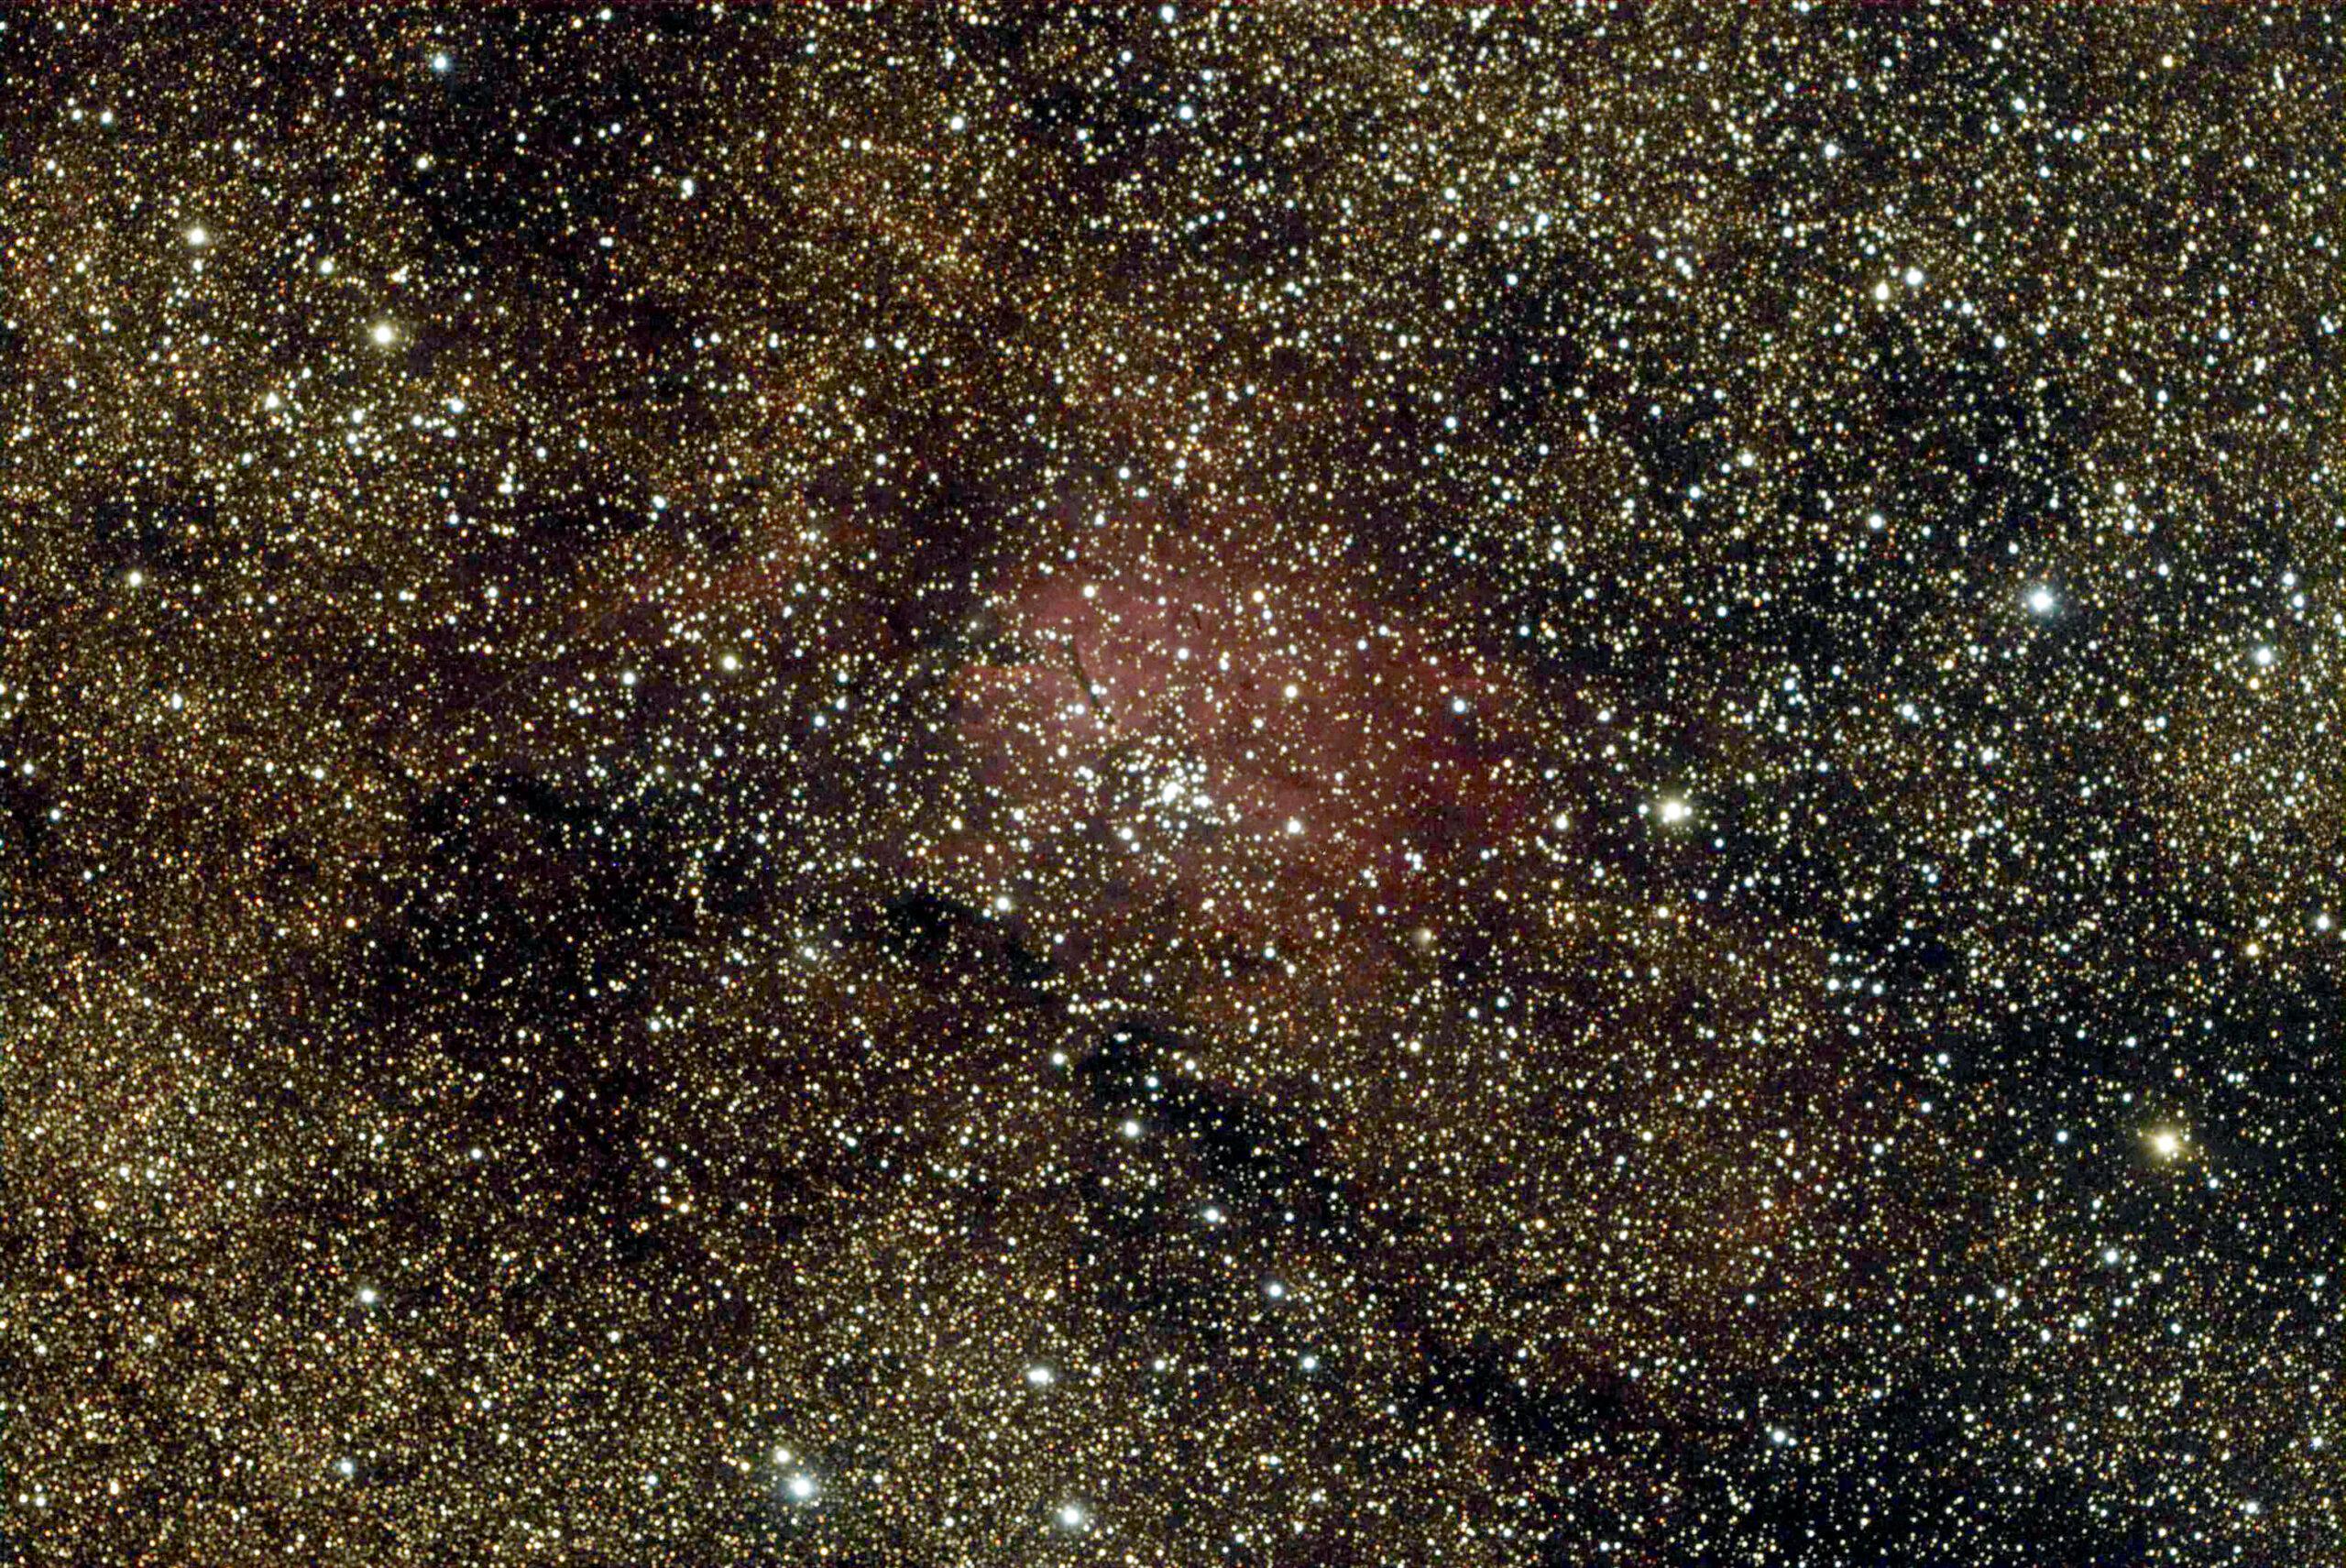 NGC6823-20210515-043233-T68_Color-BIN1-E-120-001_5x120sek_d_jdanielsson_IT